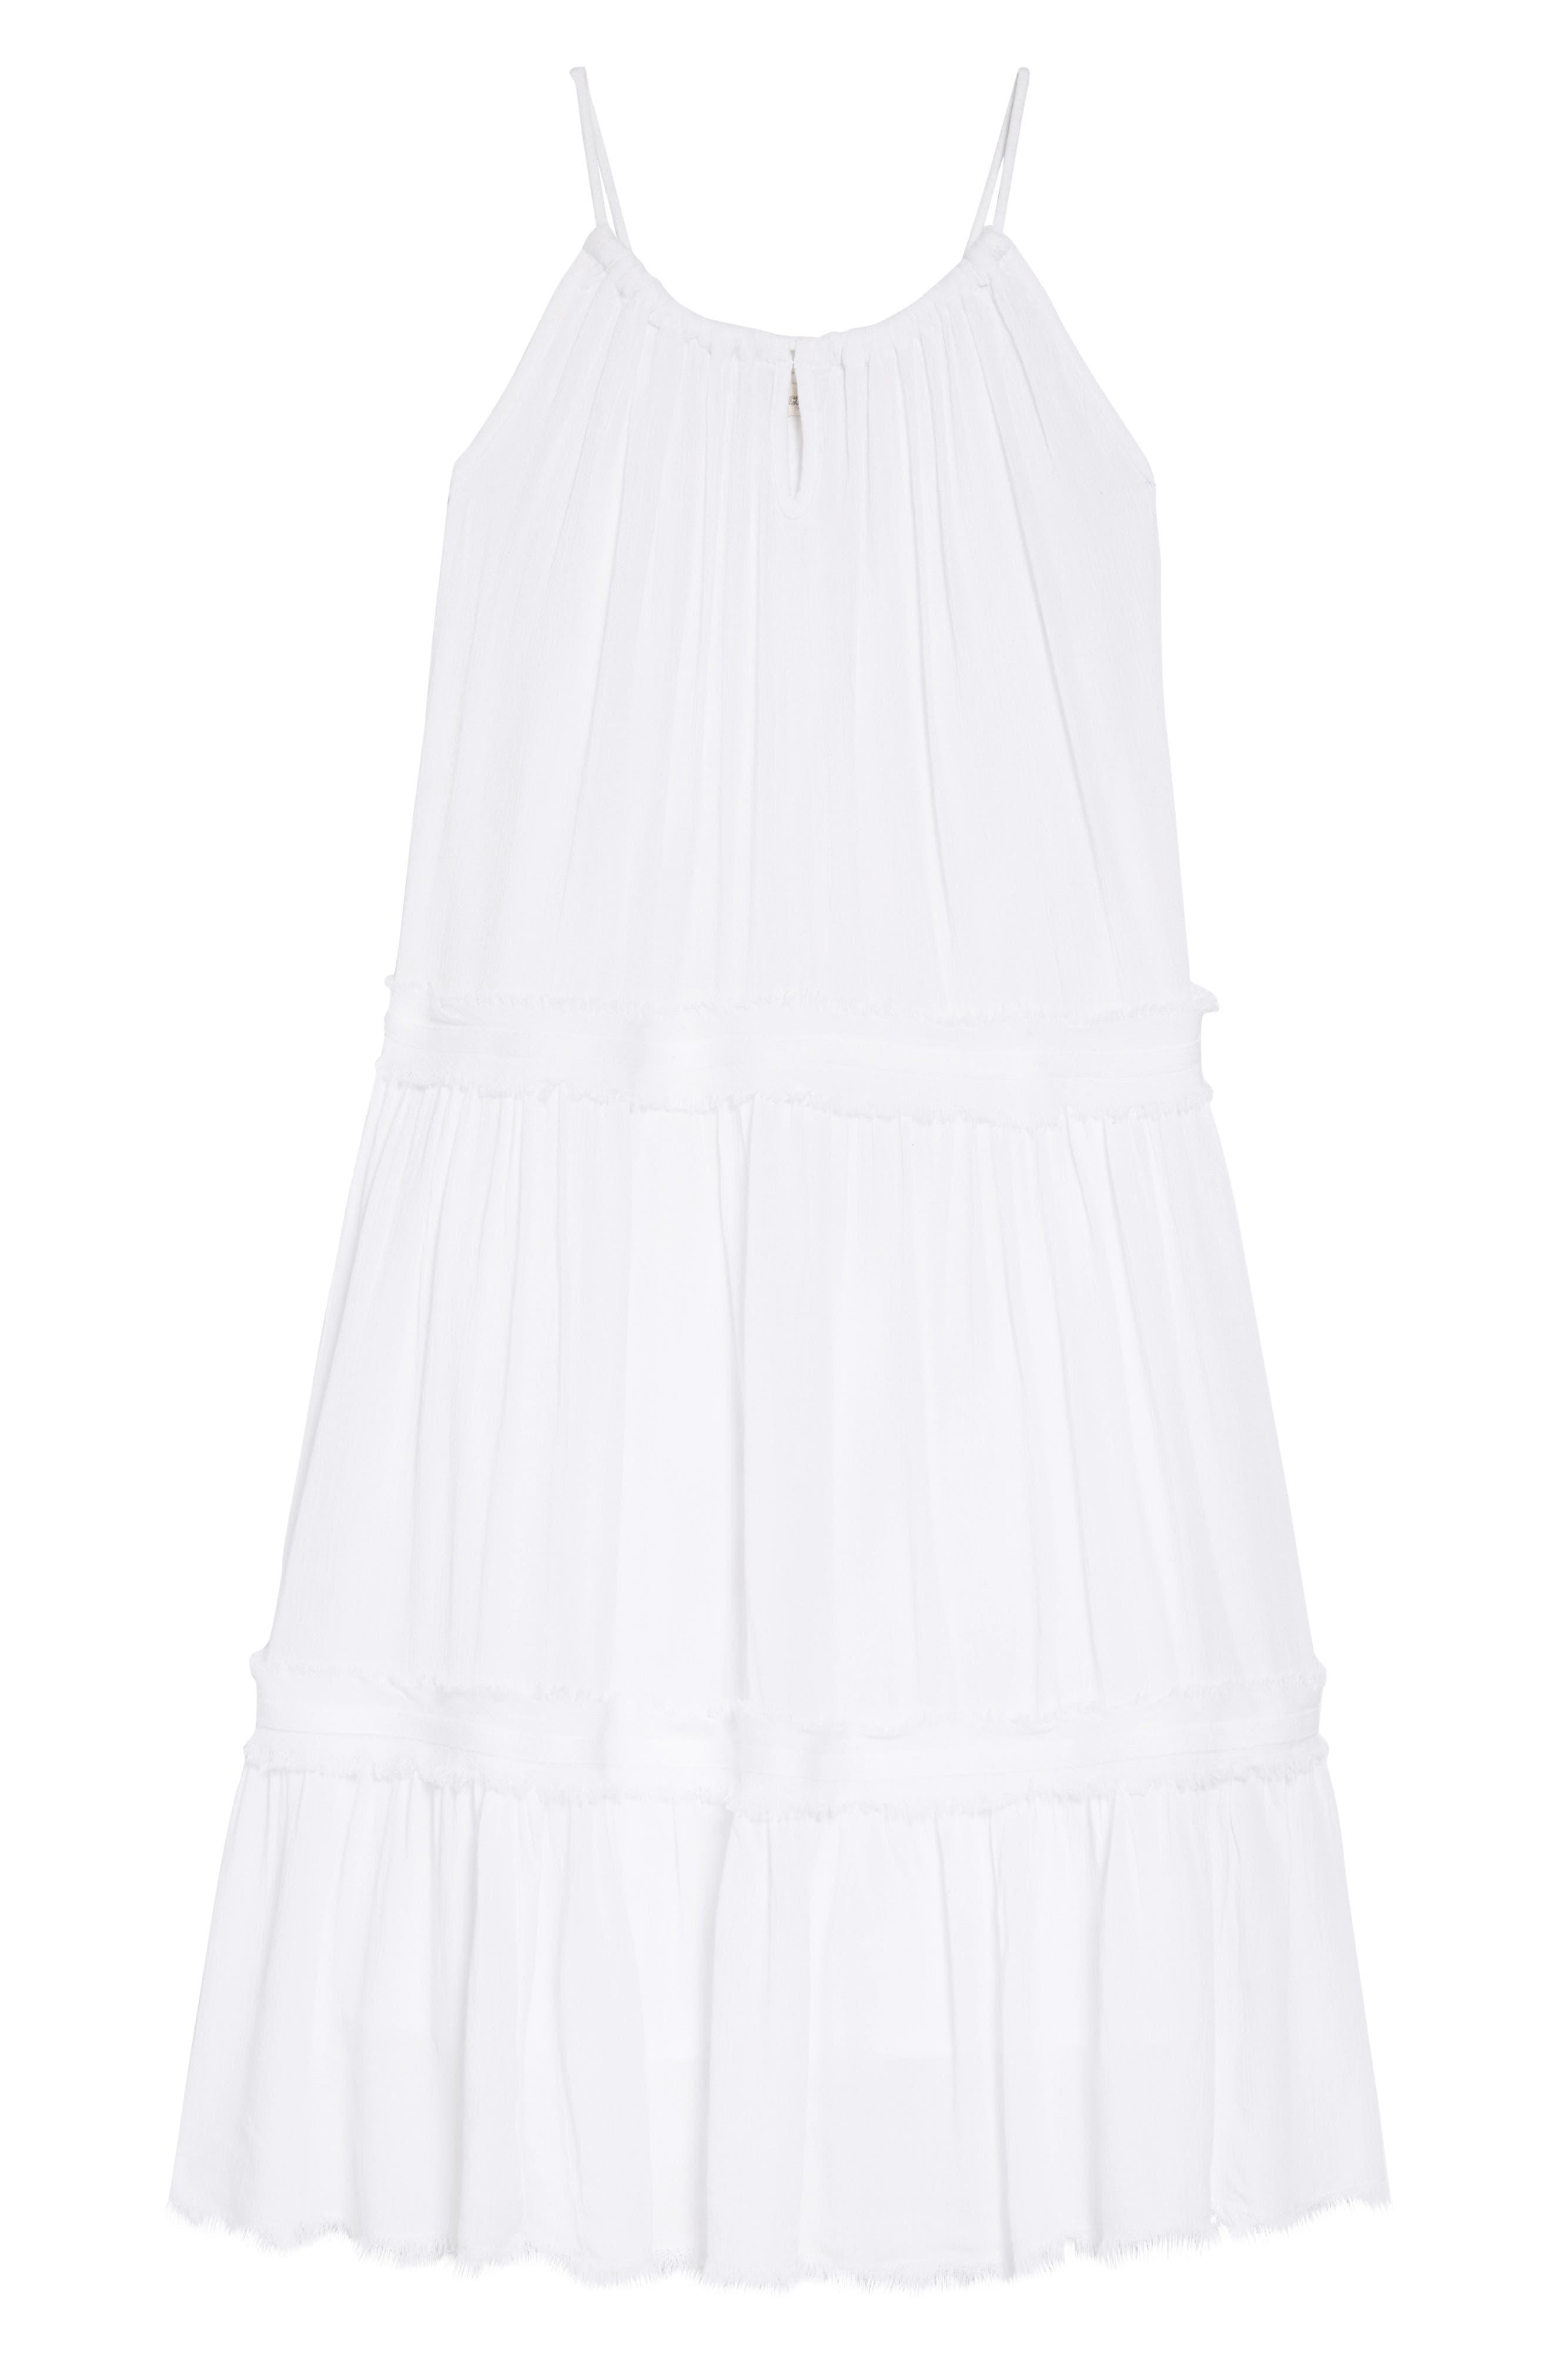 TUCKER + TATE Gauzy Tiered Sundress, Main, color, WHITE